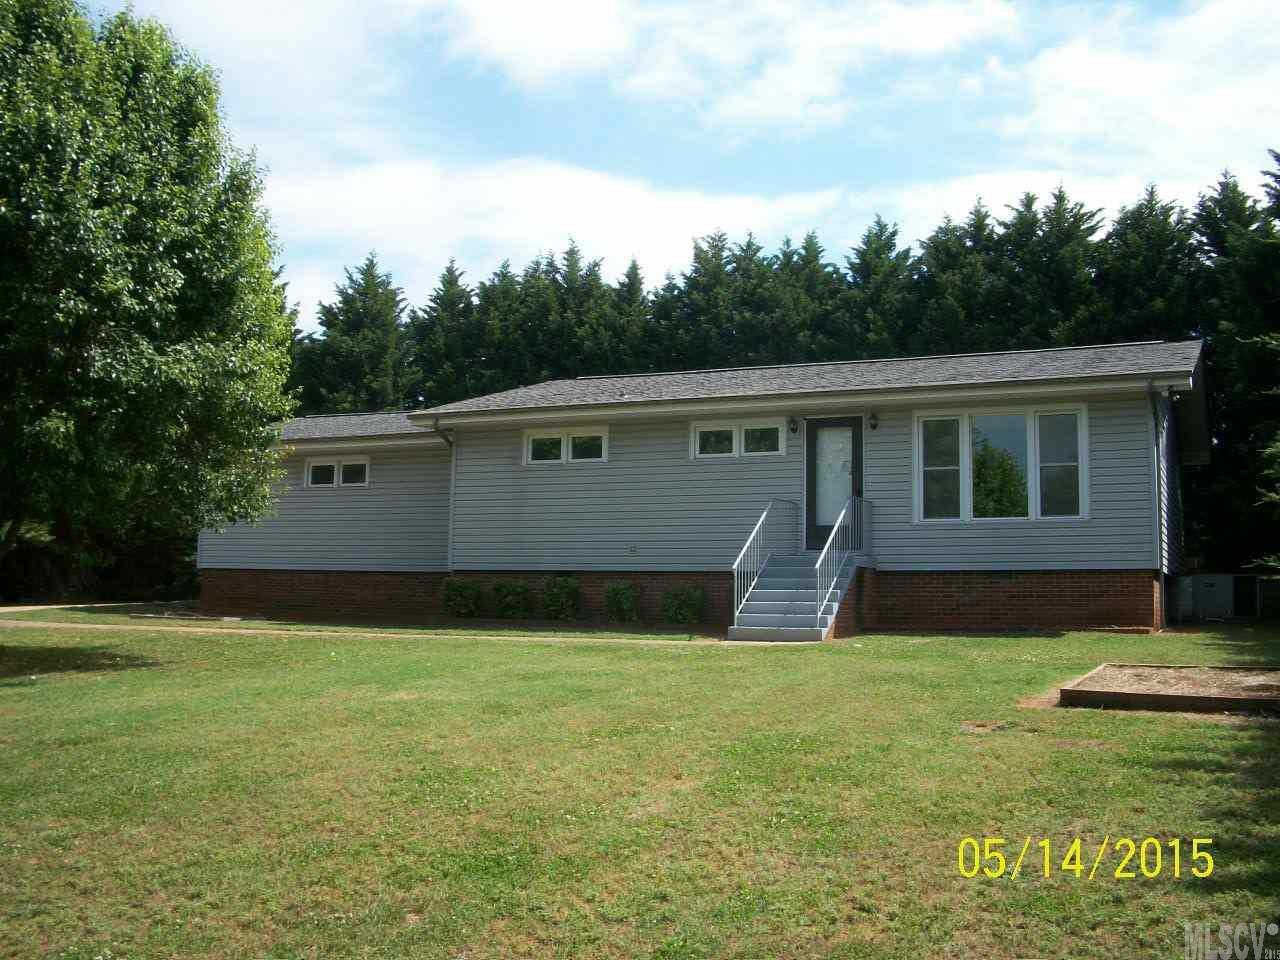 1432 Old Boxwood Cir NW, Conover, NC 28613